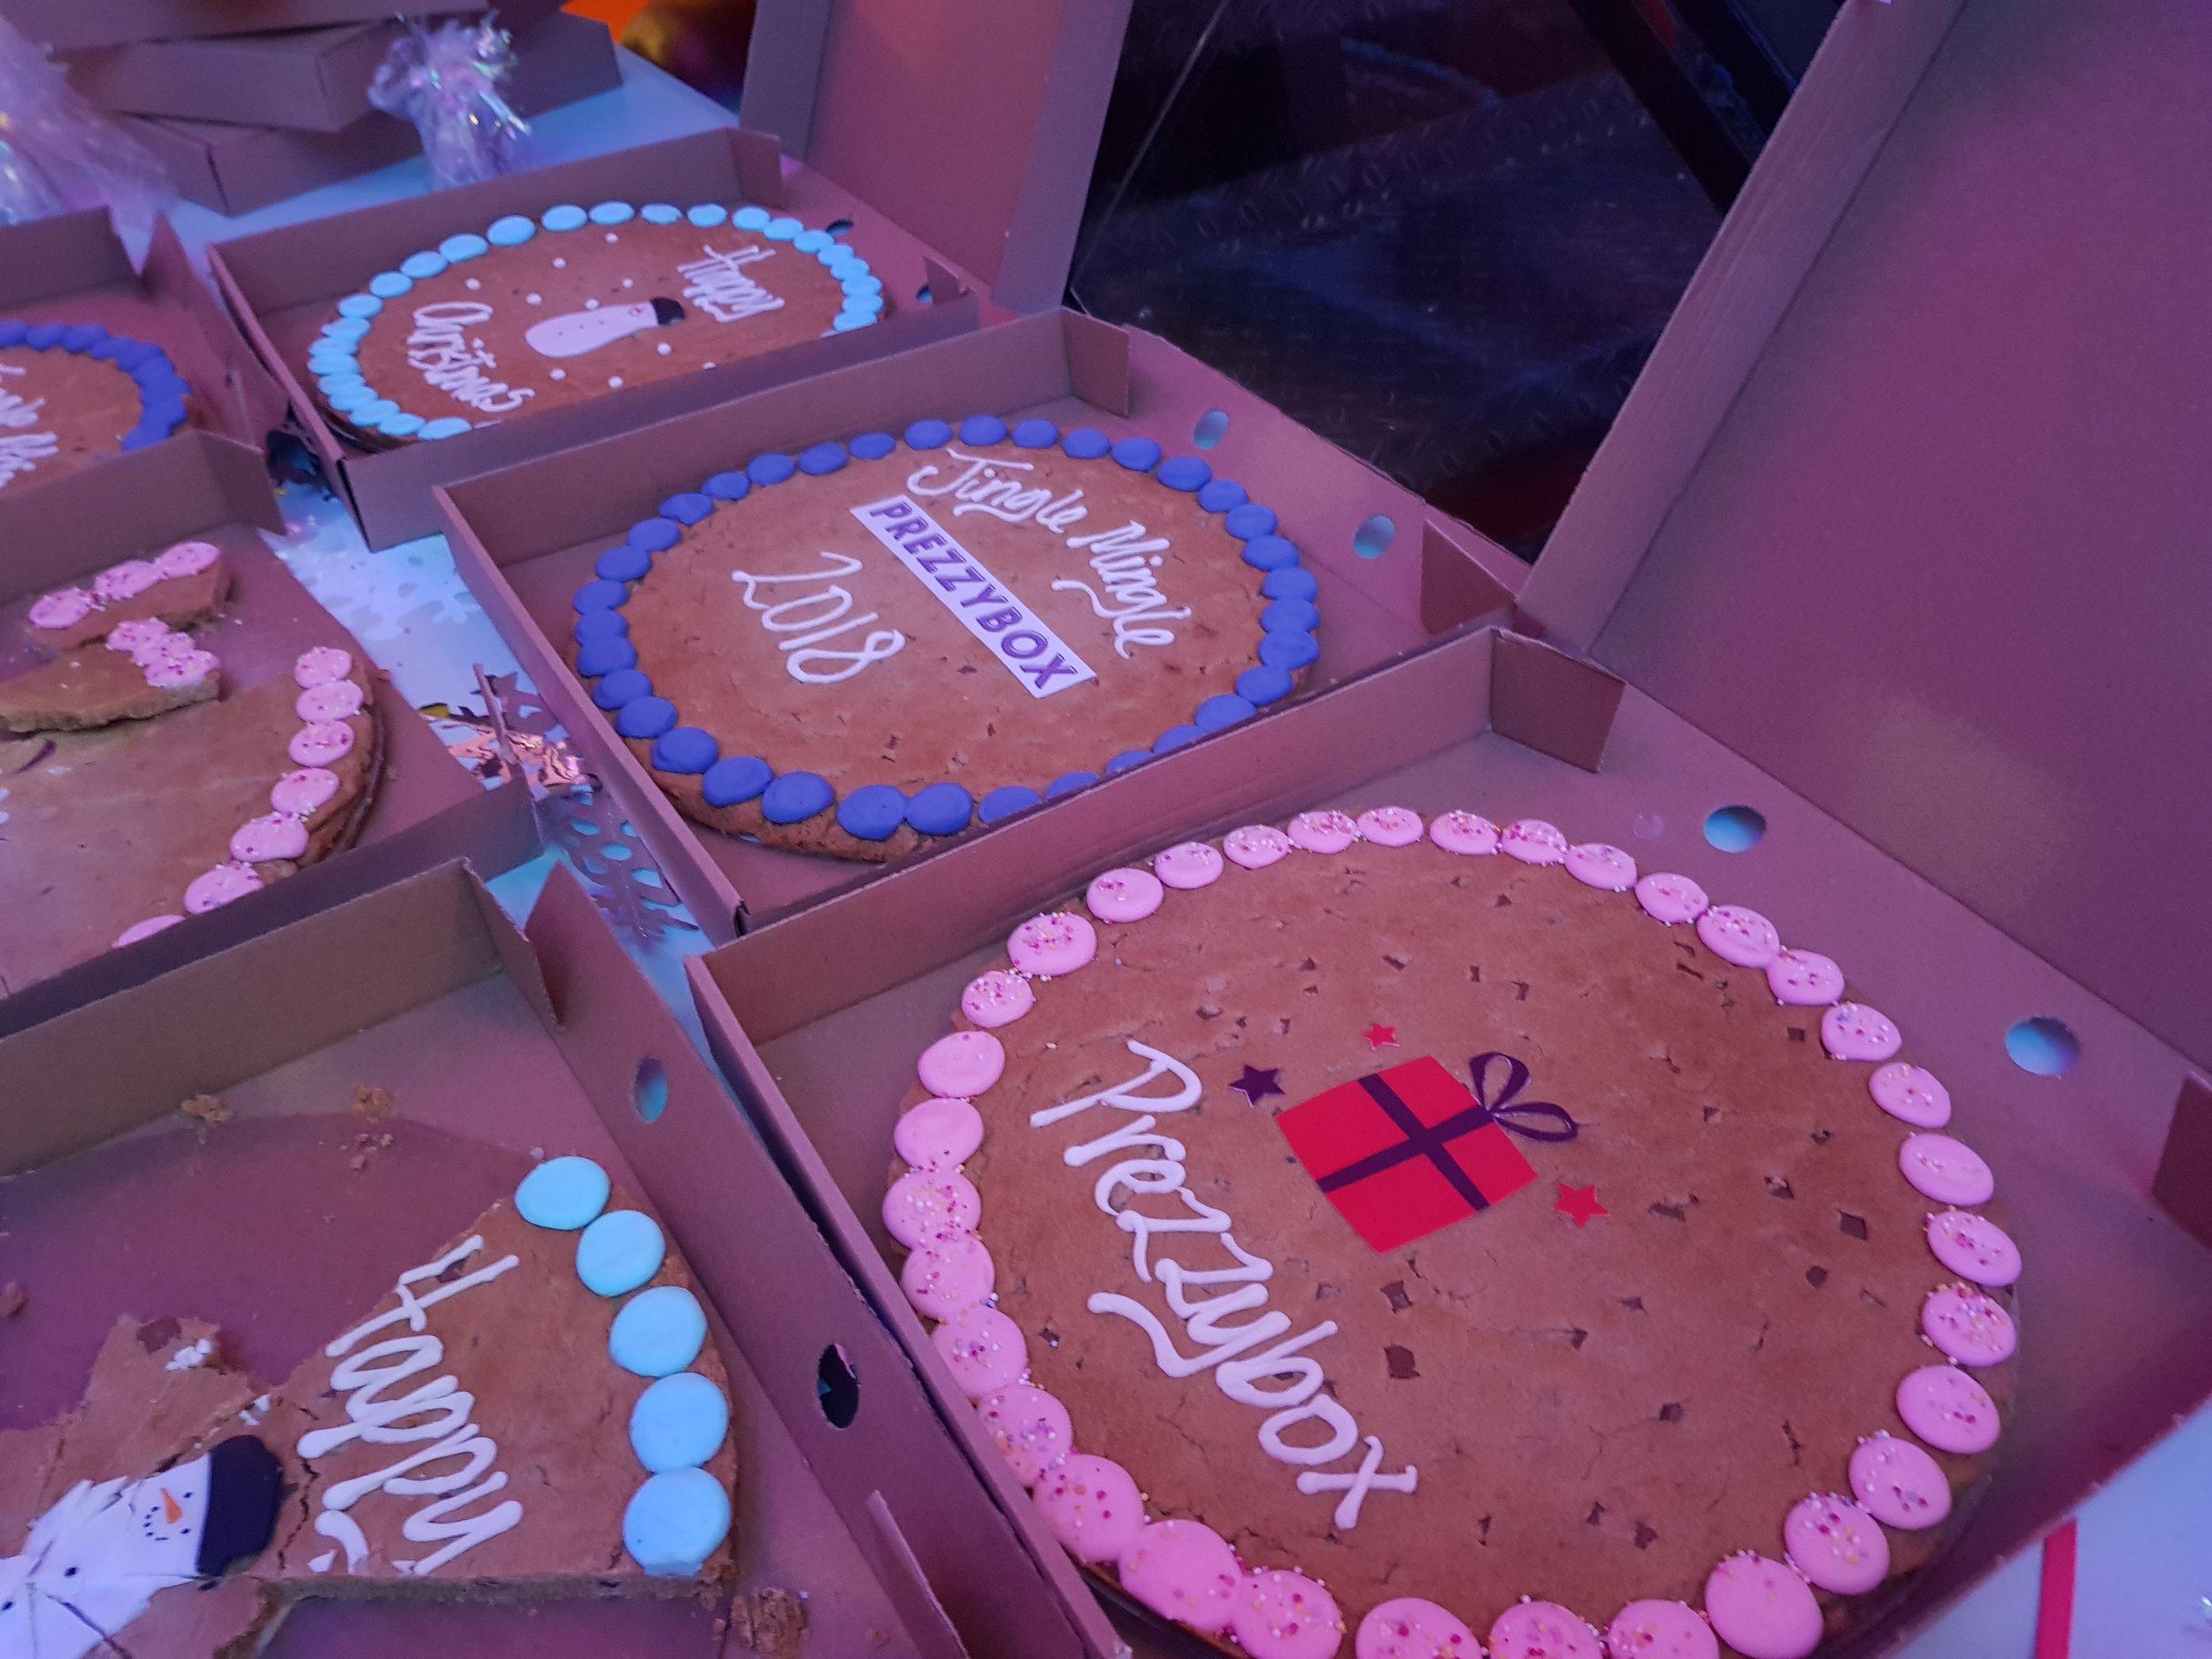 Prezzybox Jingle Mingle Ooh & Aah personalised cookies